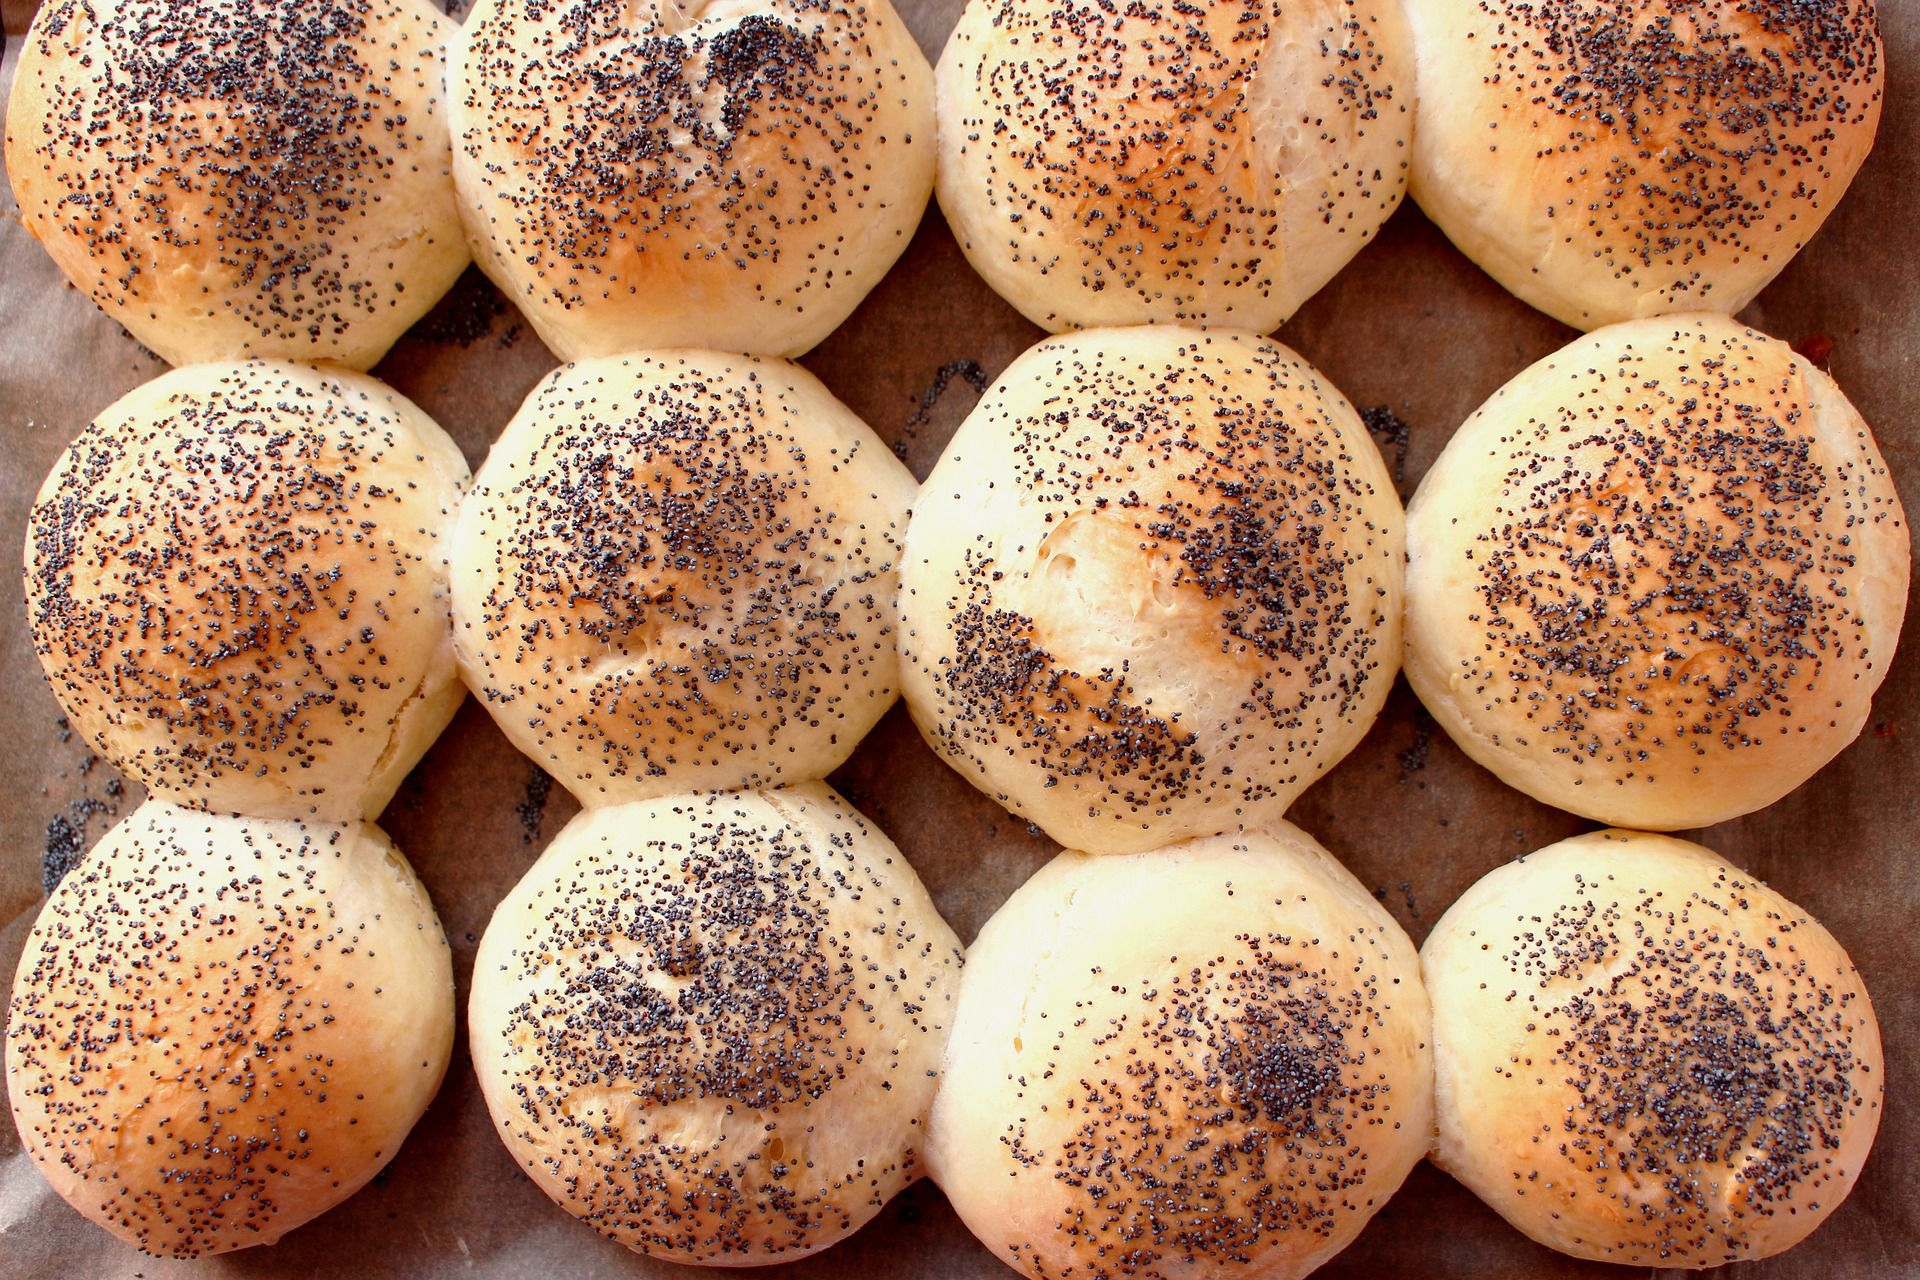 Brotchen- German rolls